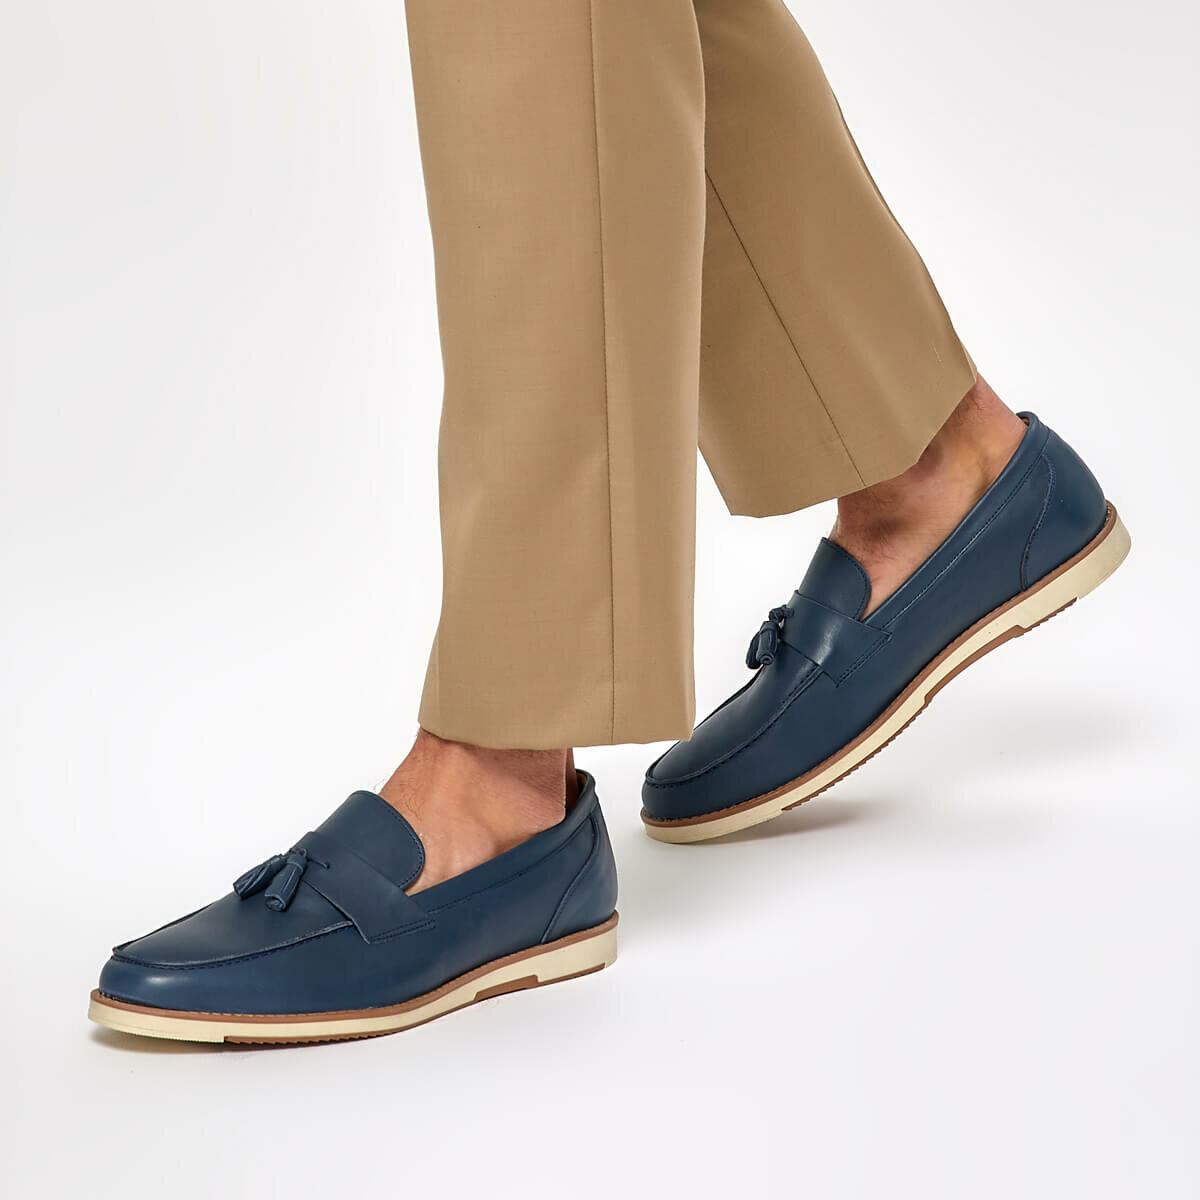 FLO ERG-300 Navy Blue Men 'S Classic Shoes Garamond